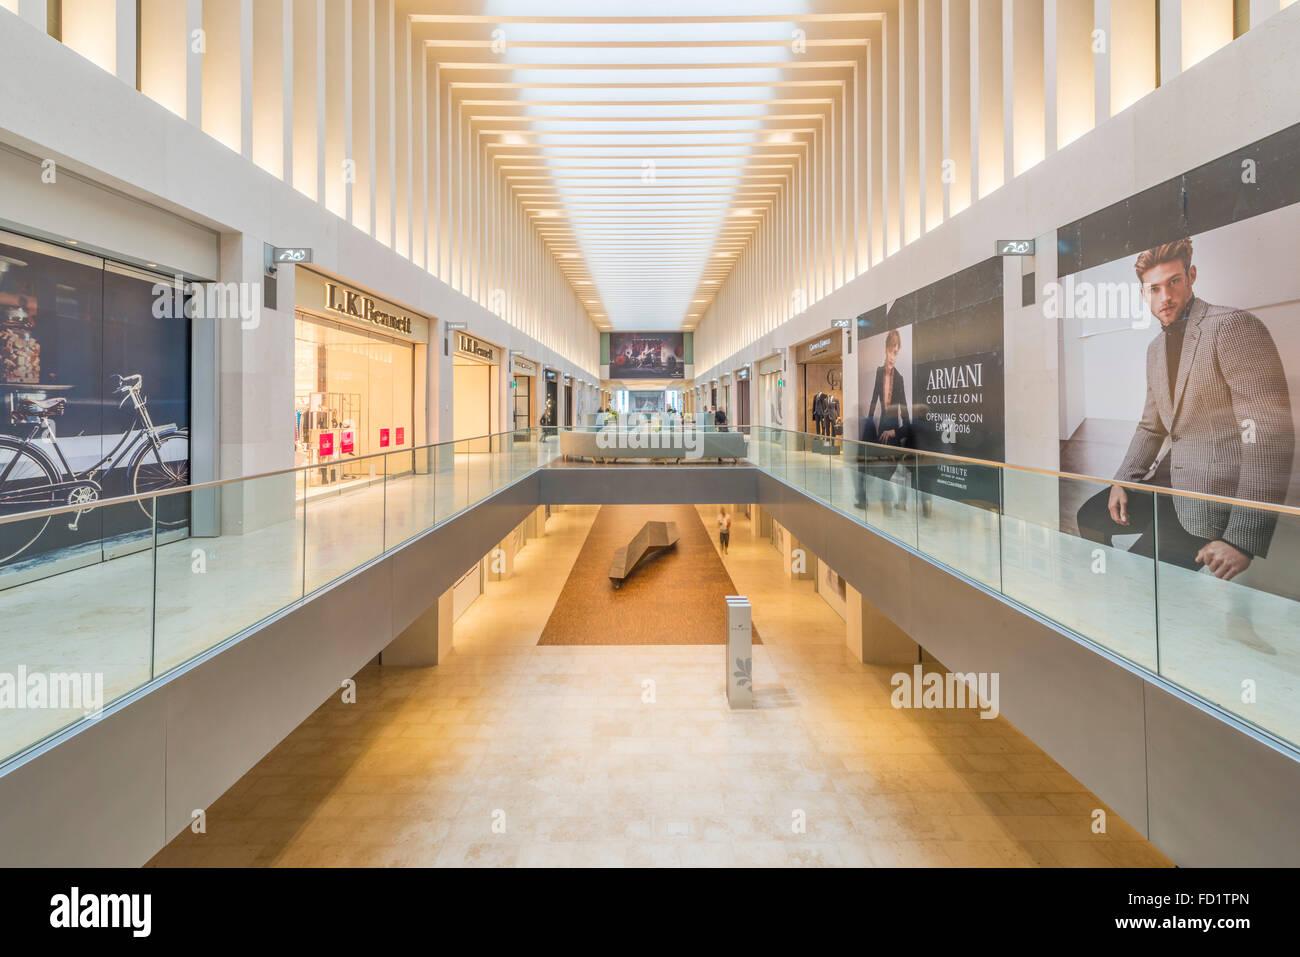 The Mailbox shopping centre, Birmingham, England, UK. - Stock Image